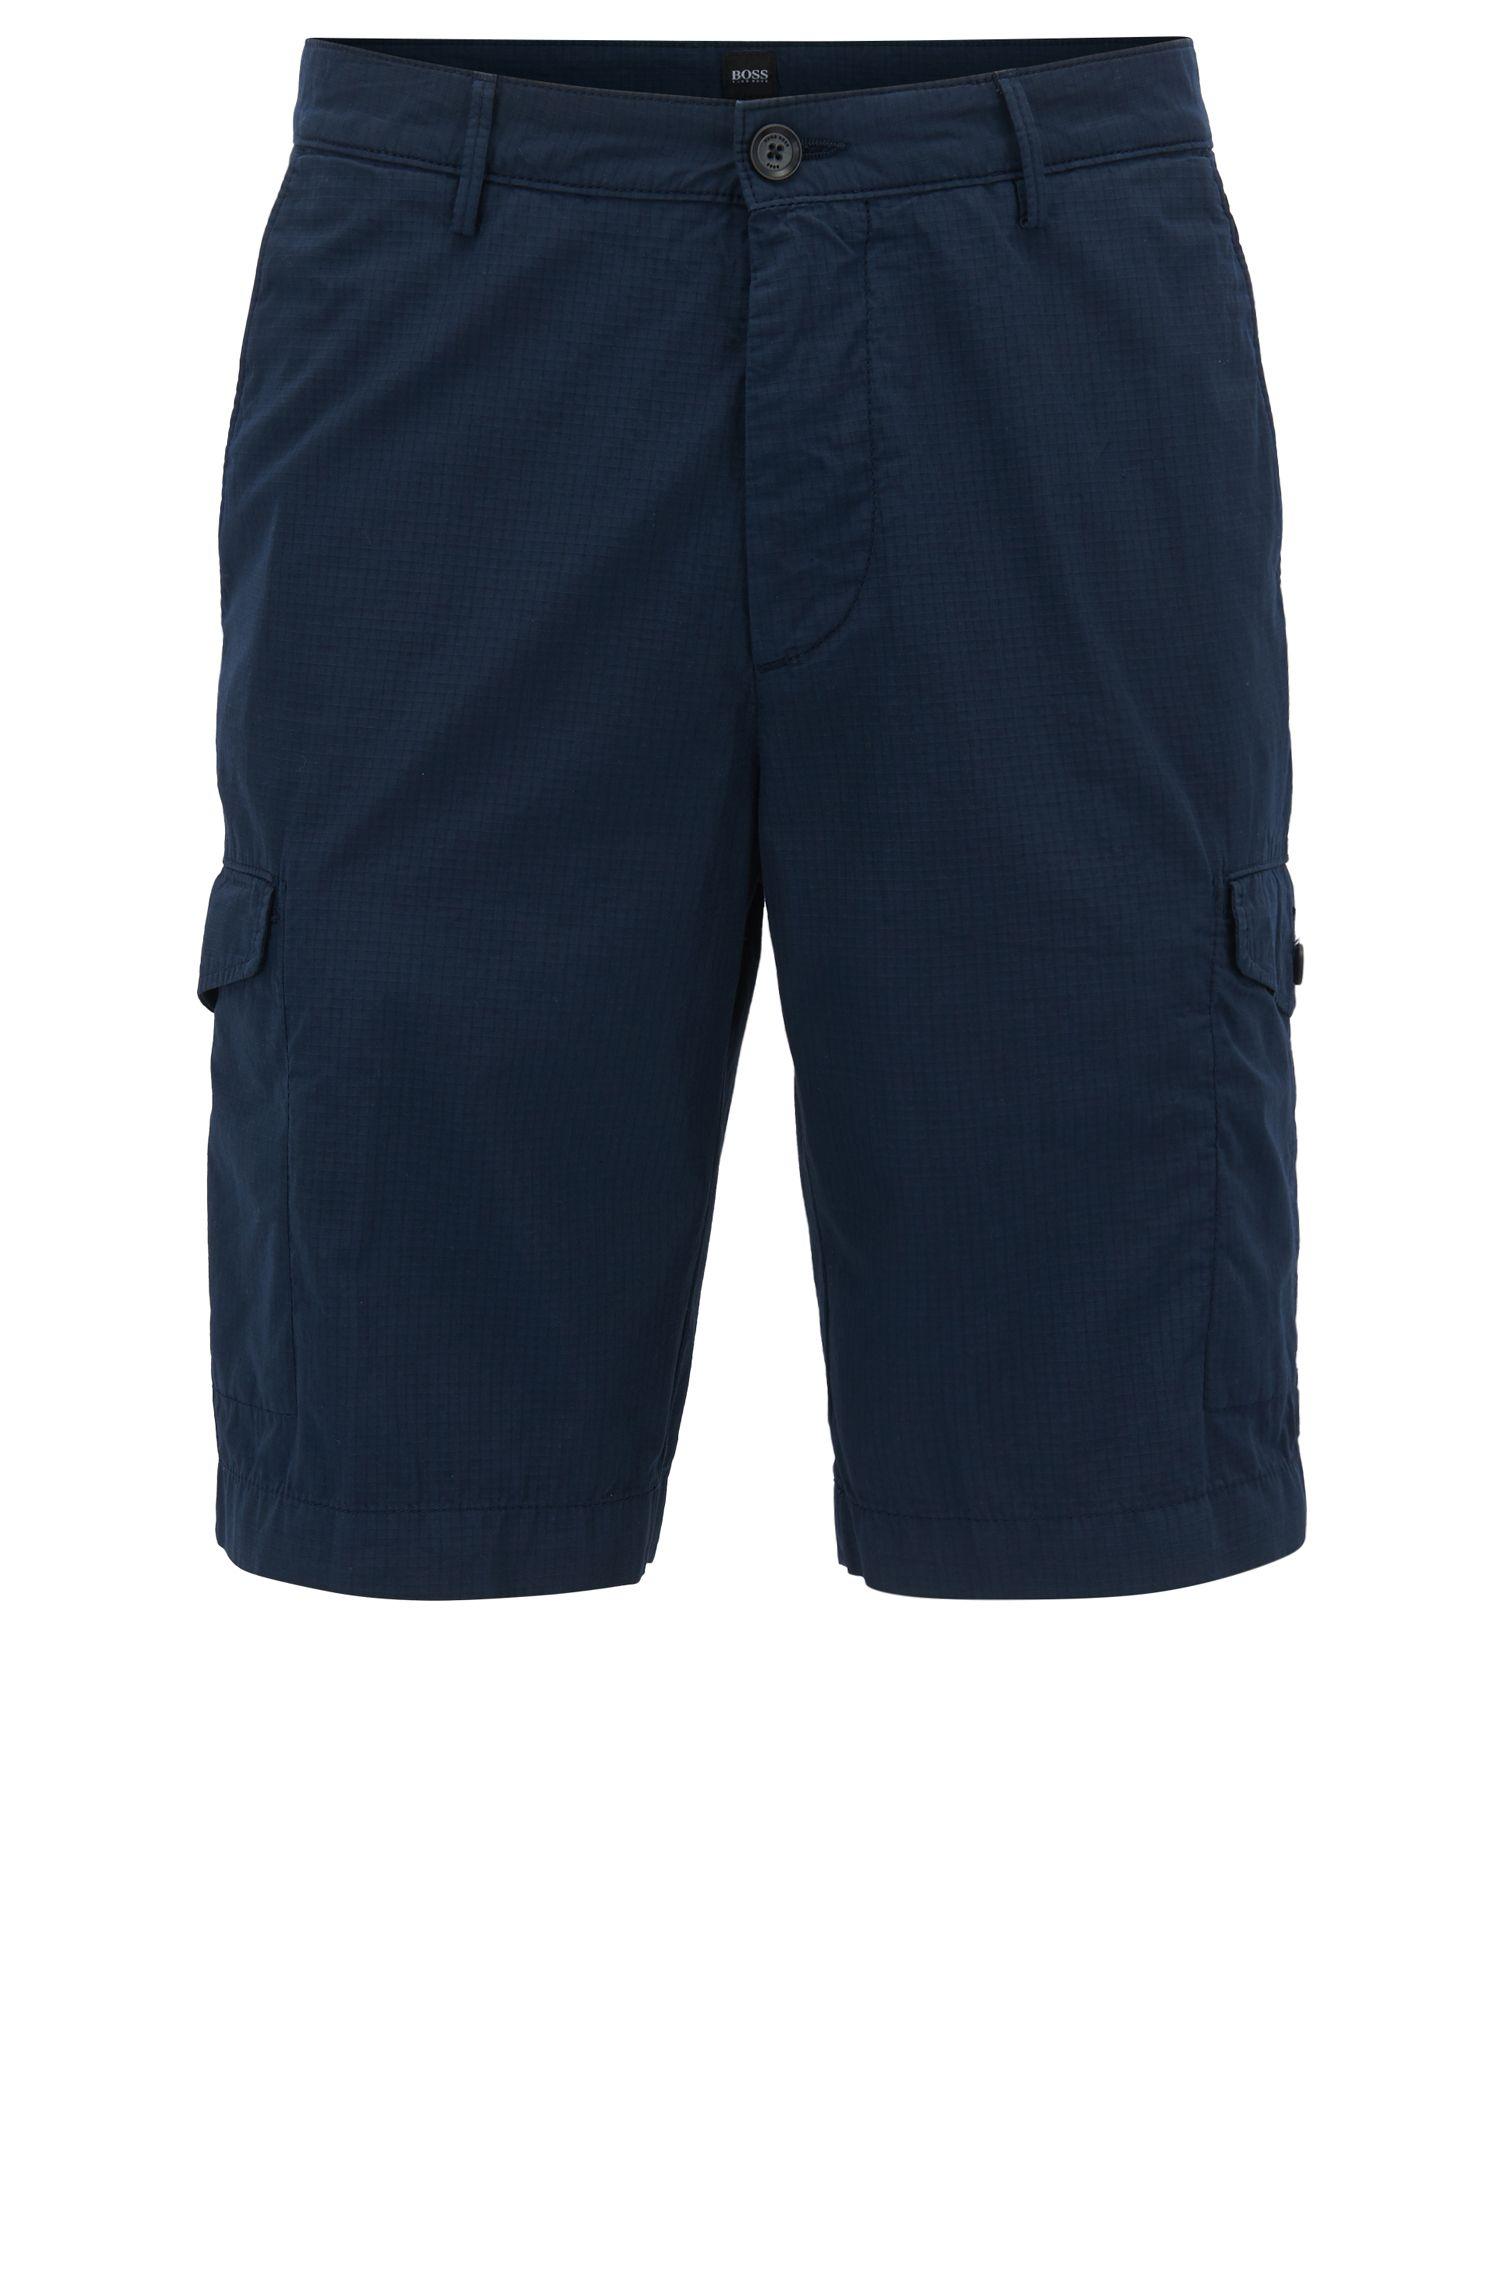 Shorts cargo en algodón italiano antidesgarros